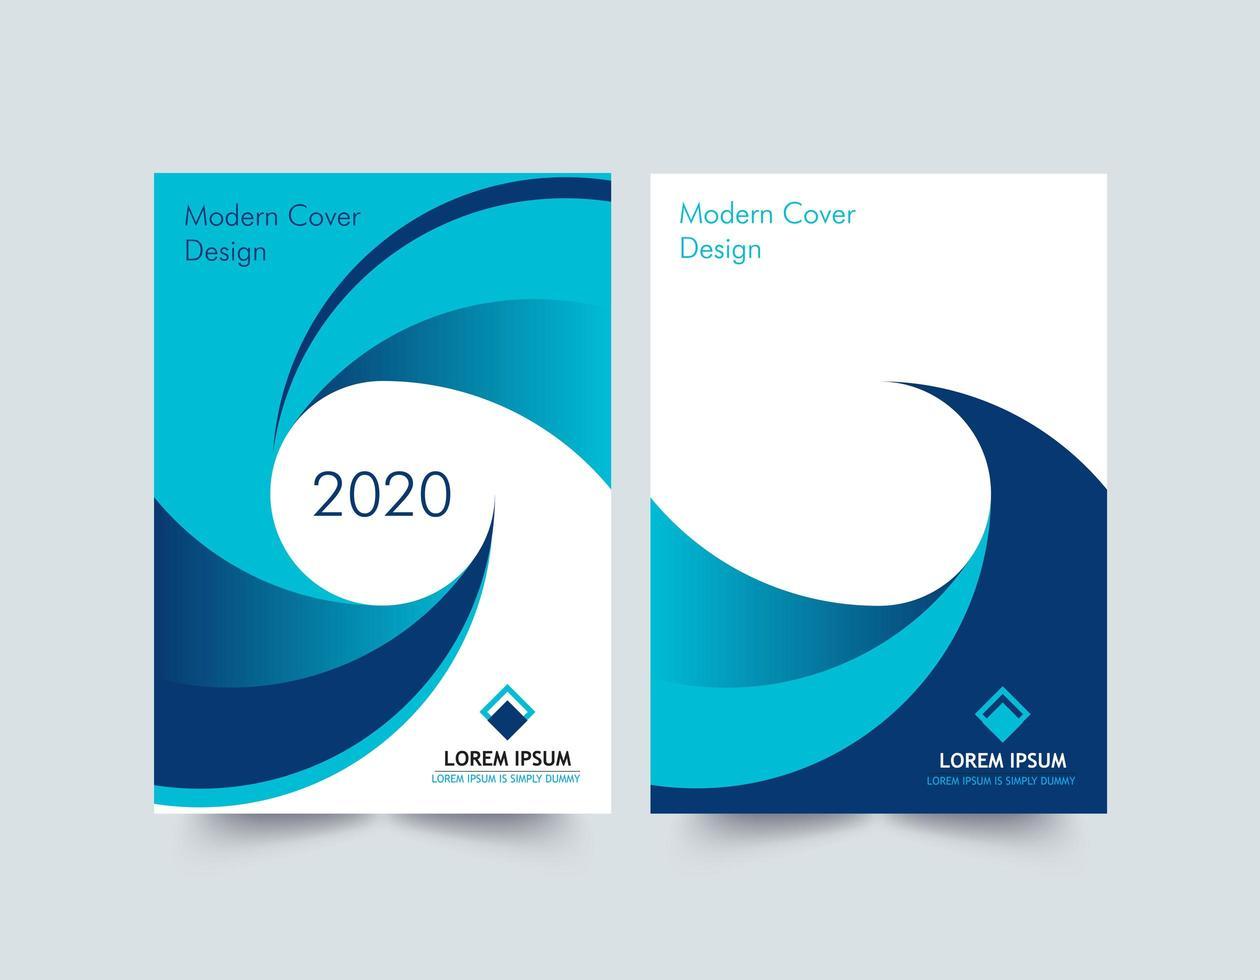 moderne Corporate Cover Design Vorlage vektor